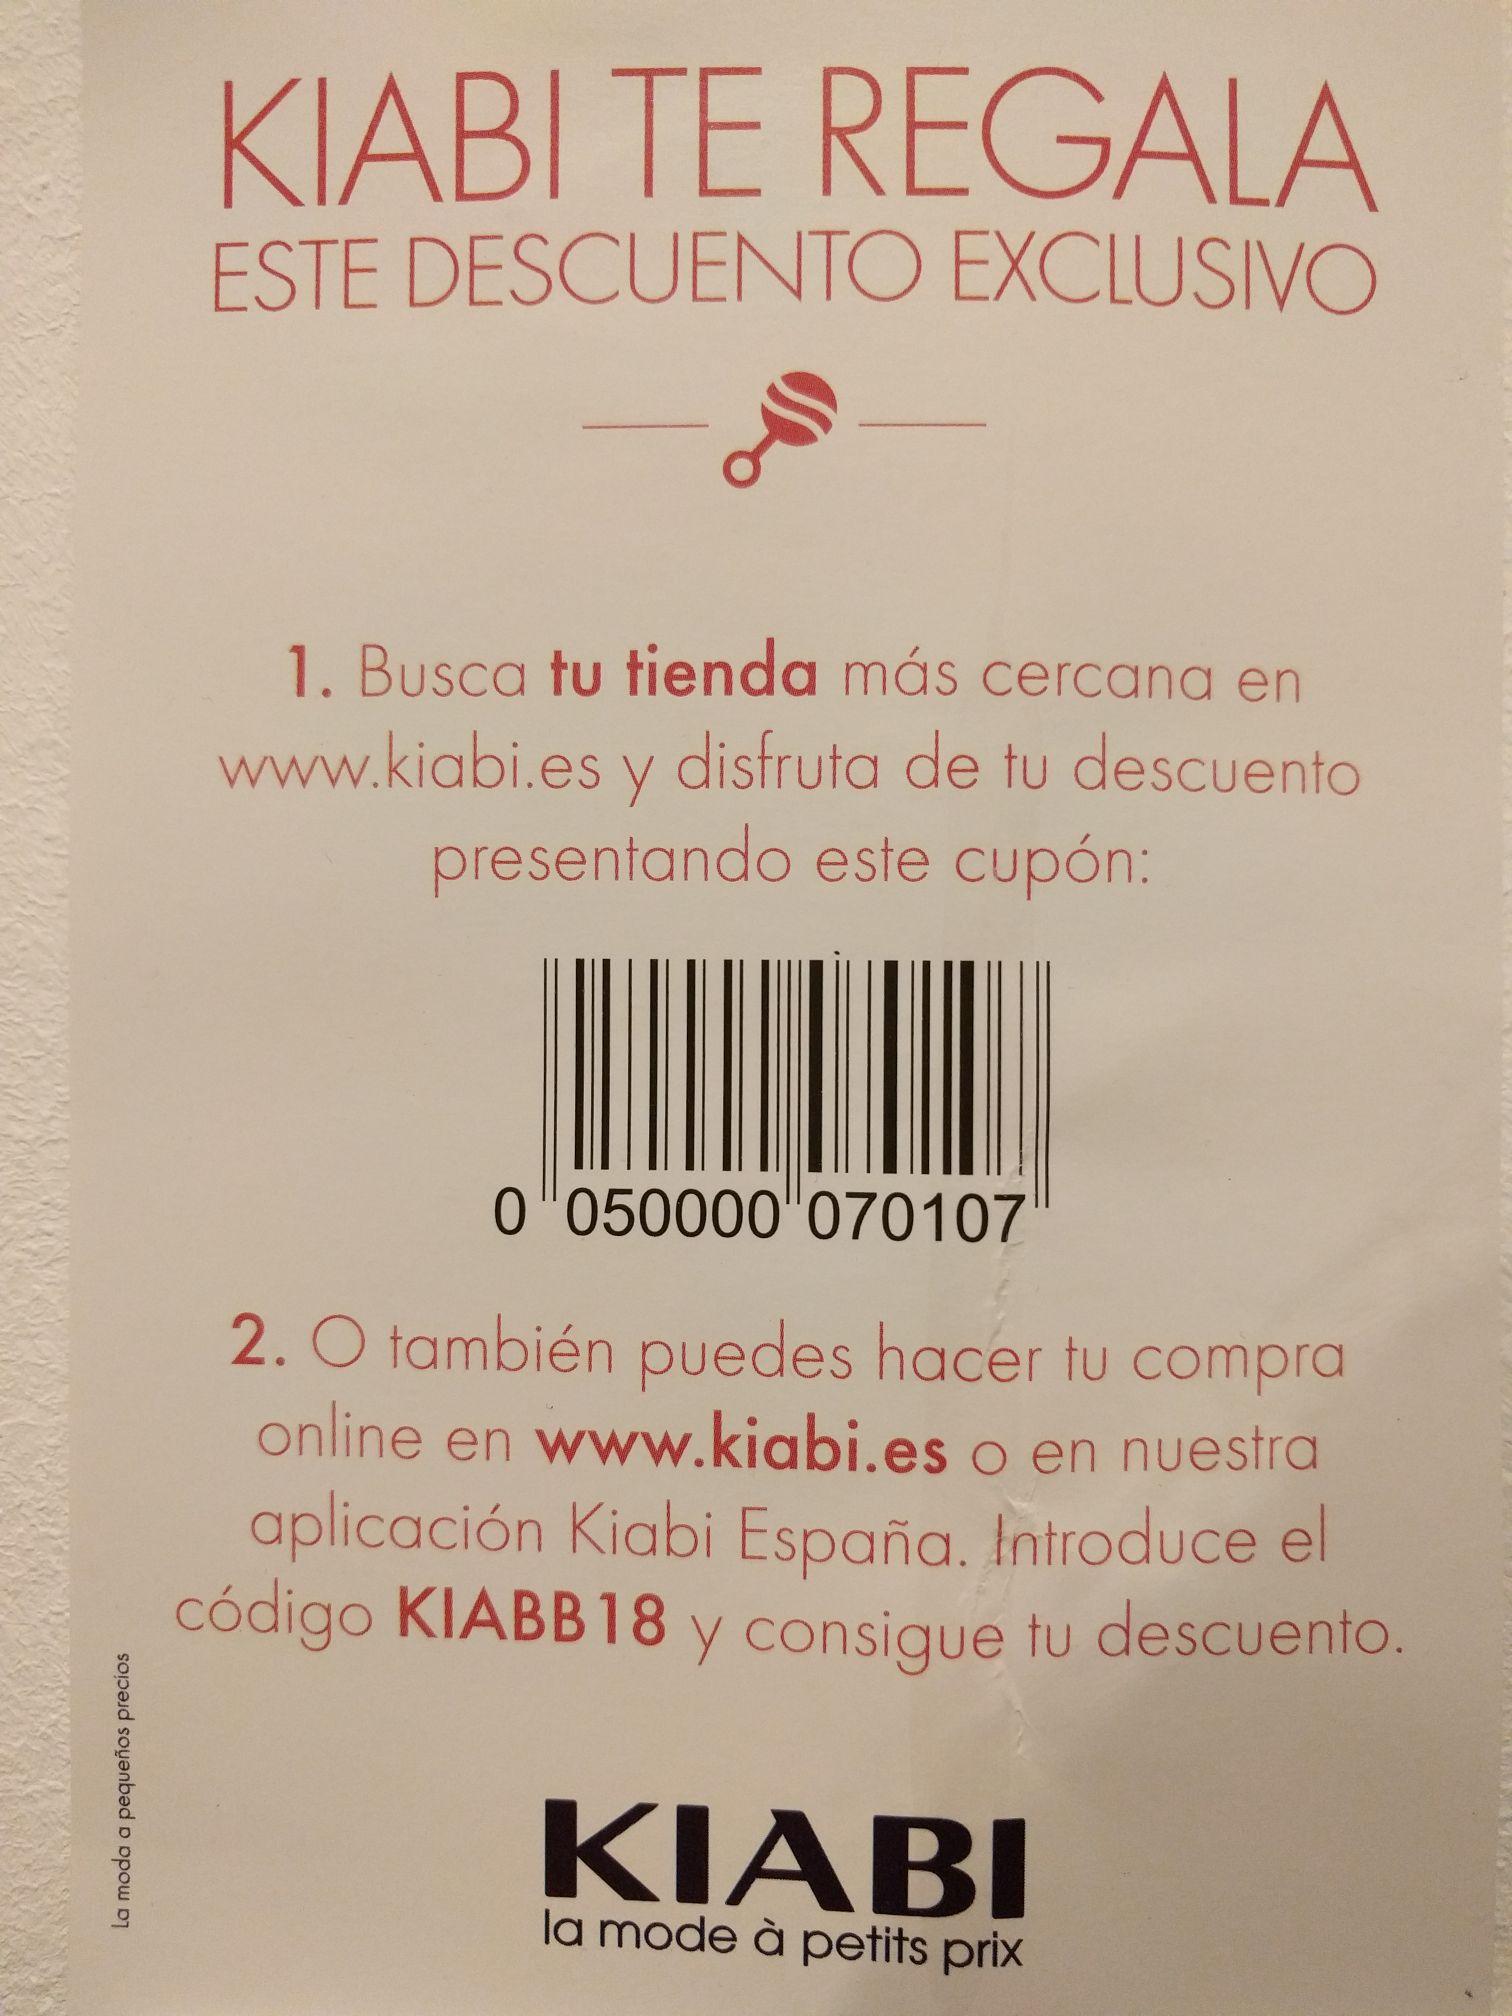 10€ de descuento por compras de 40€ o mas